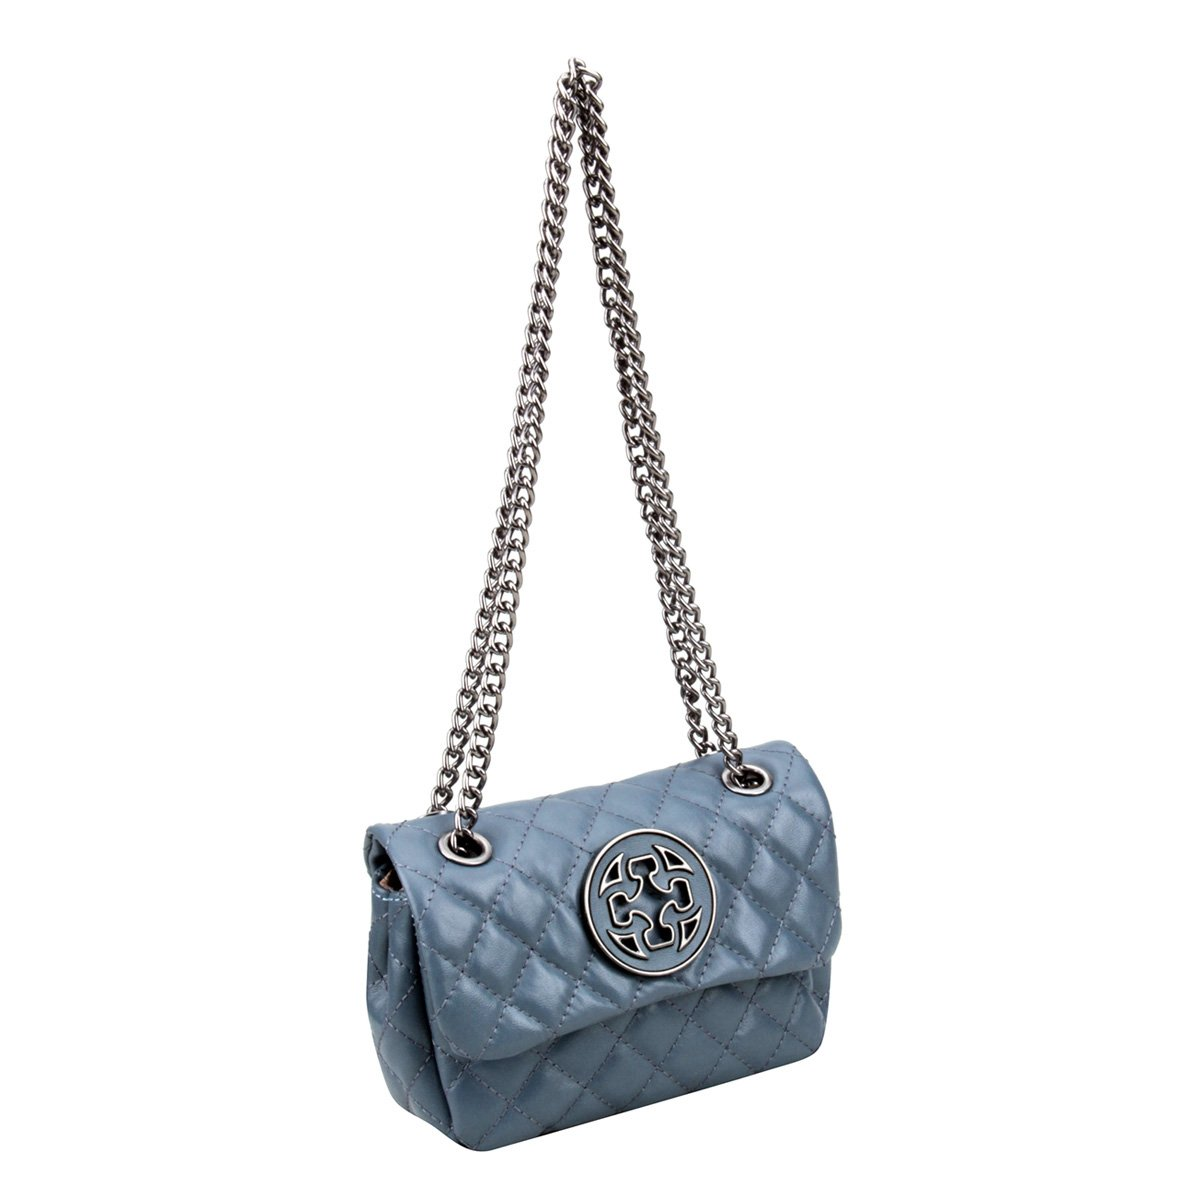 Bolsa Feminina Vitello Capodarte Azul Matelassê Couro Bolsa Couro 4aYqgCn4wr